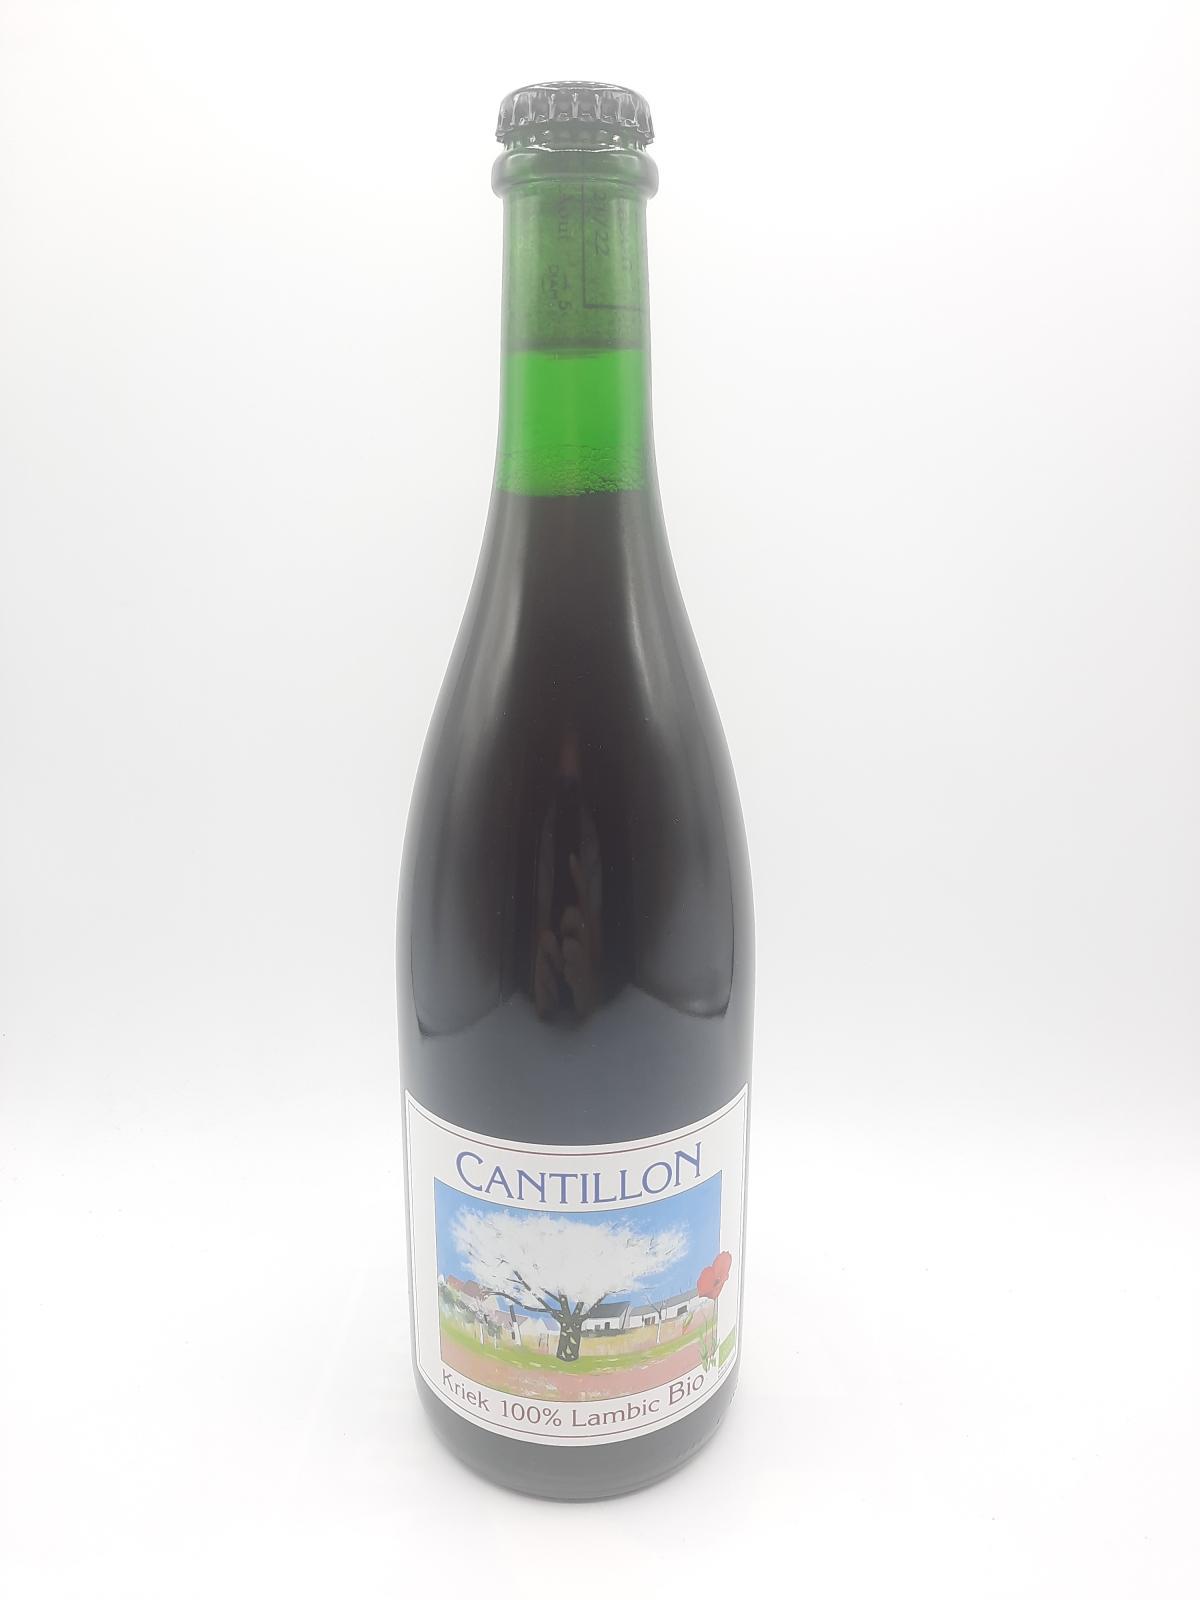 Image Cantillon Kriek 75cl